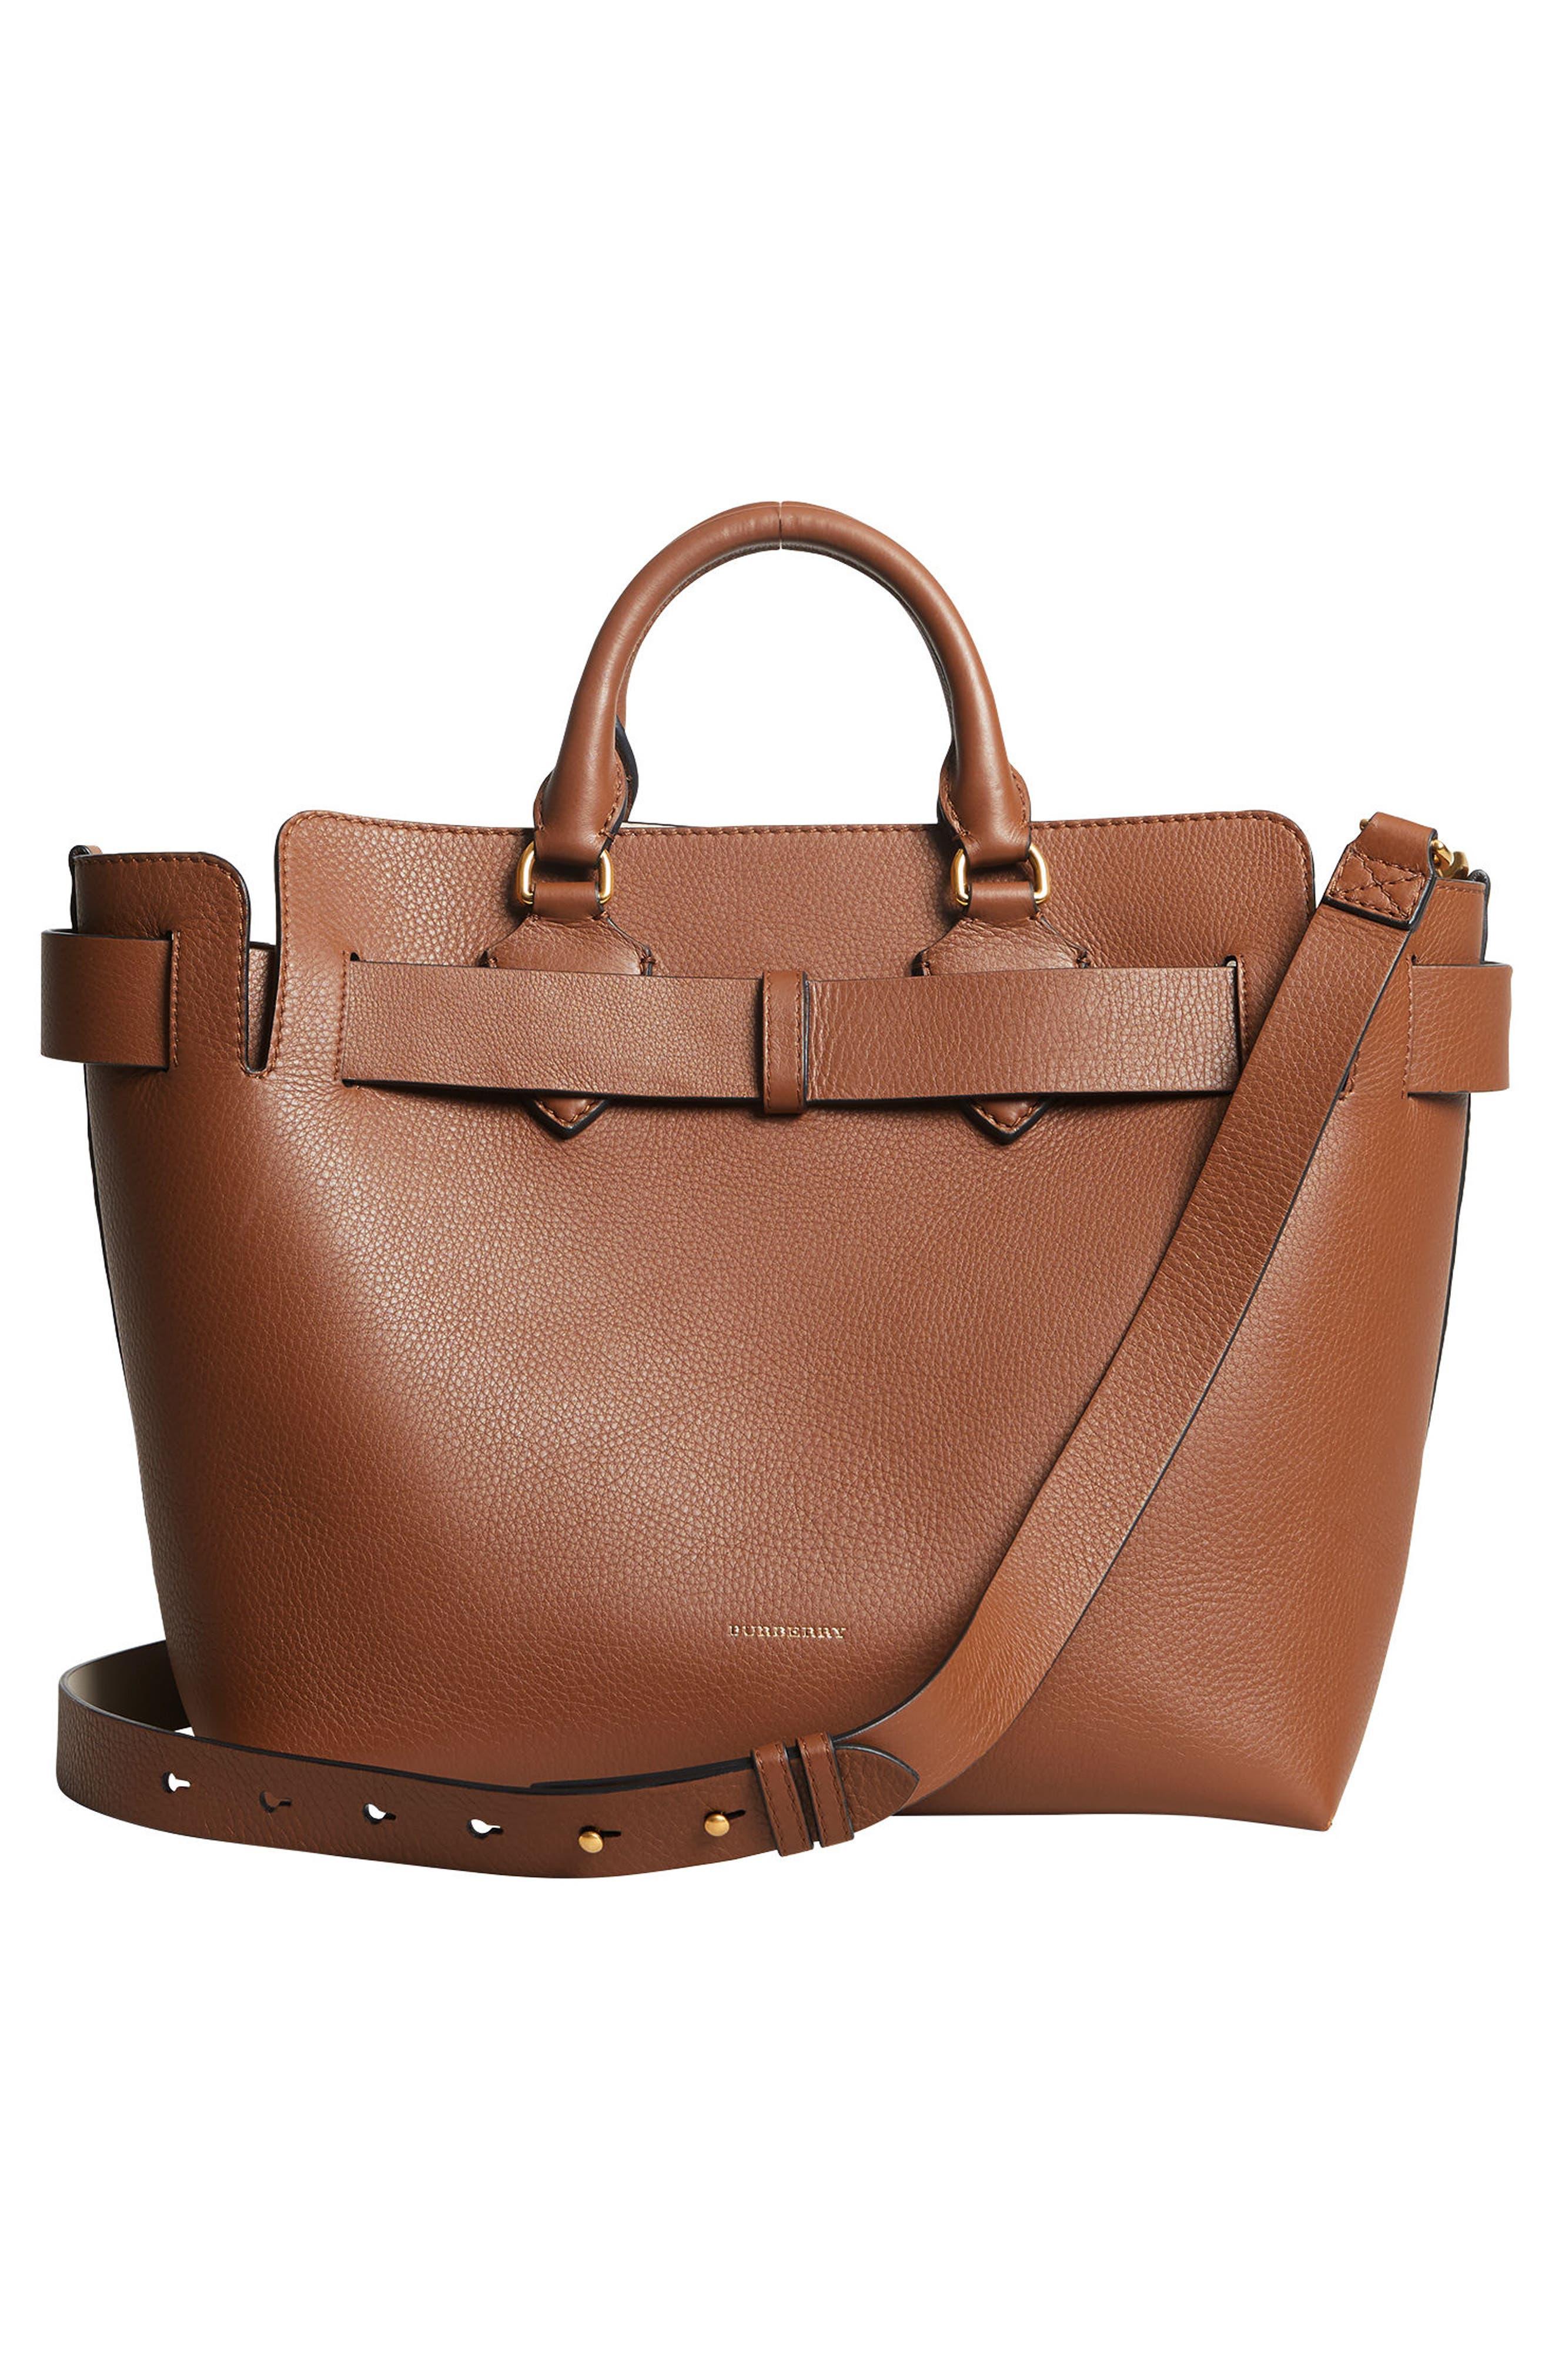 Medium Belt Bag Leather Tote,                             Alternate thumbnail 3, color,                             216